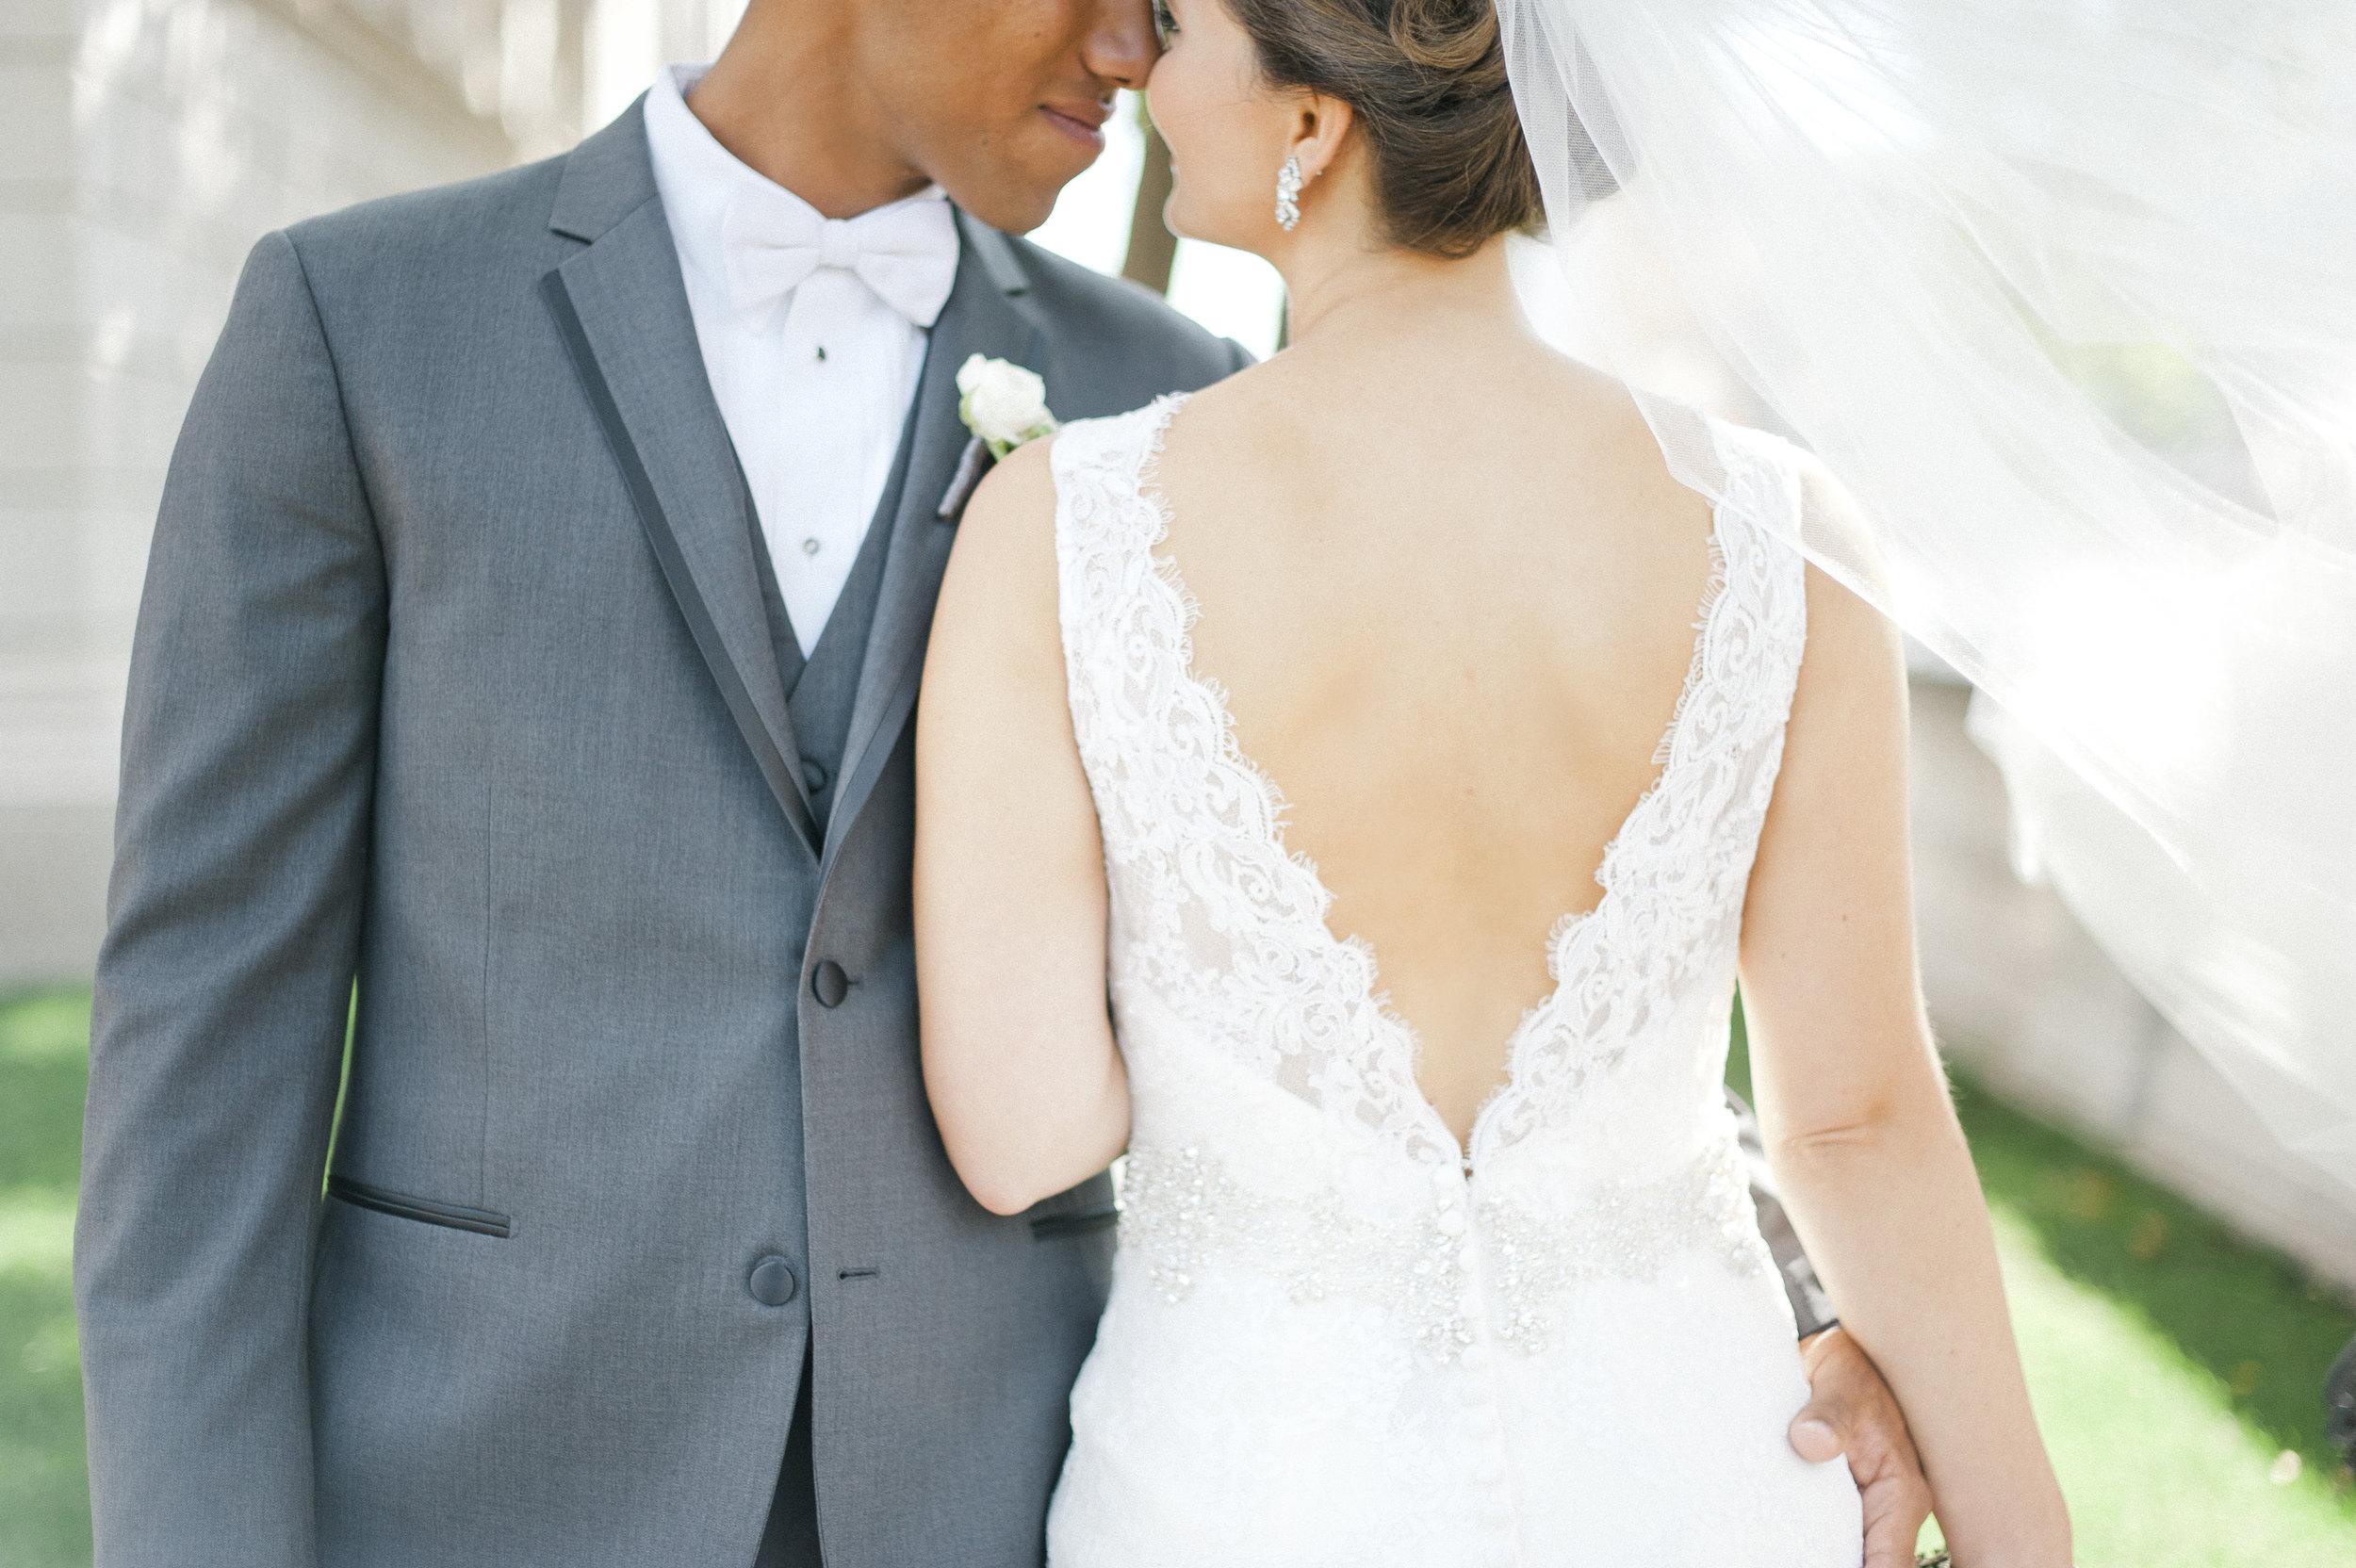 Lovell-Dillahunty Wedding_312.jpg